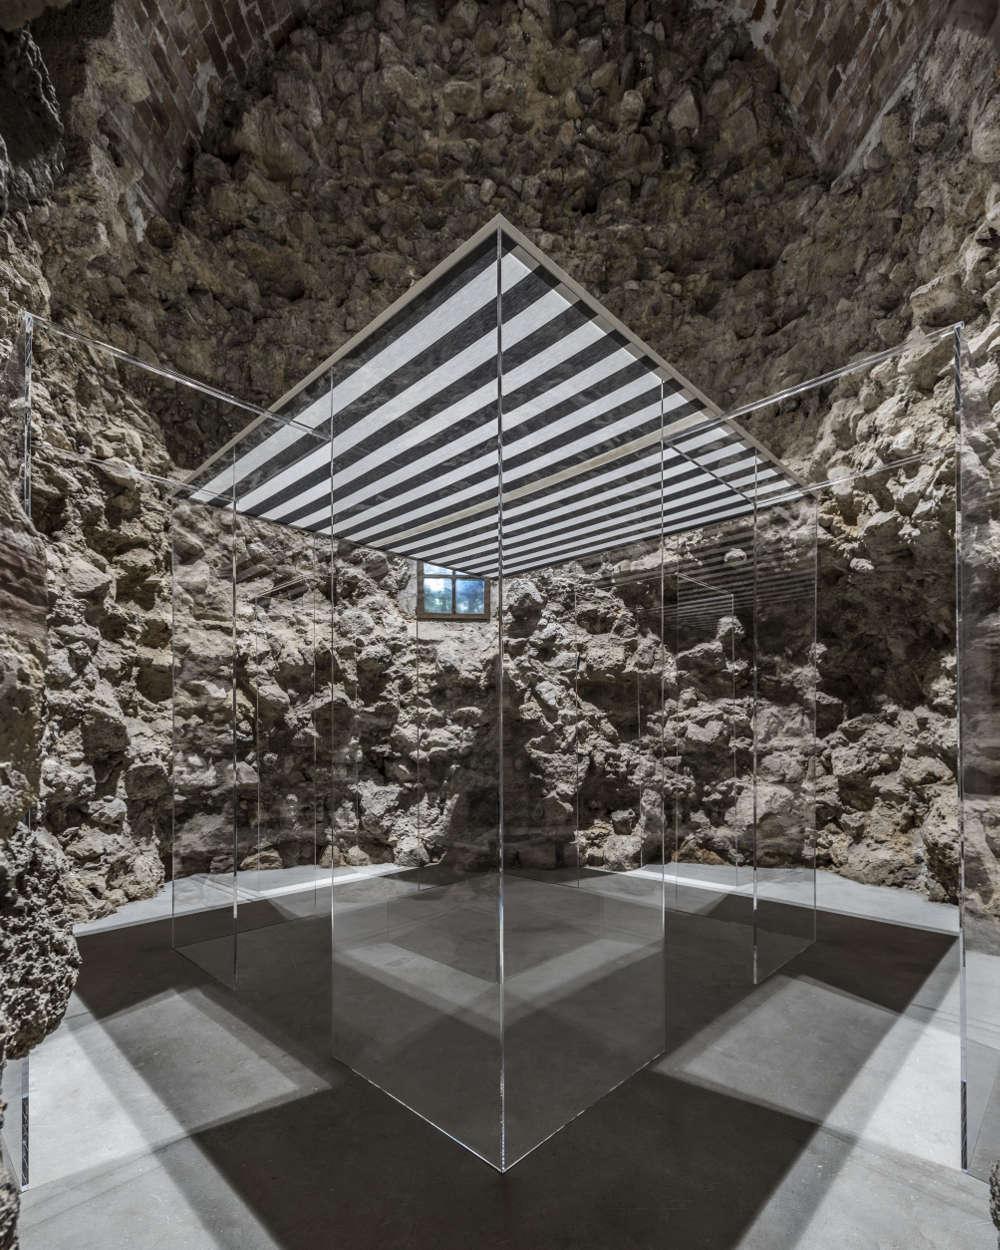 Galleria Continua San Gimignano Daniel Buren Anish Kapoor 9